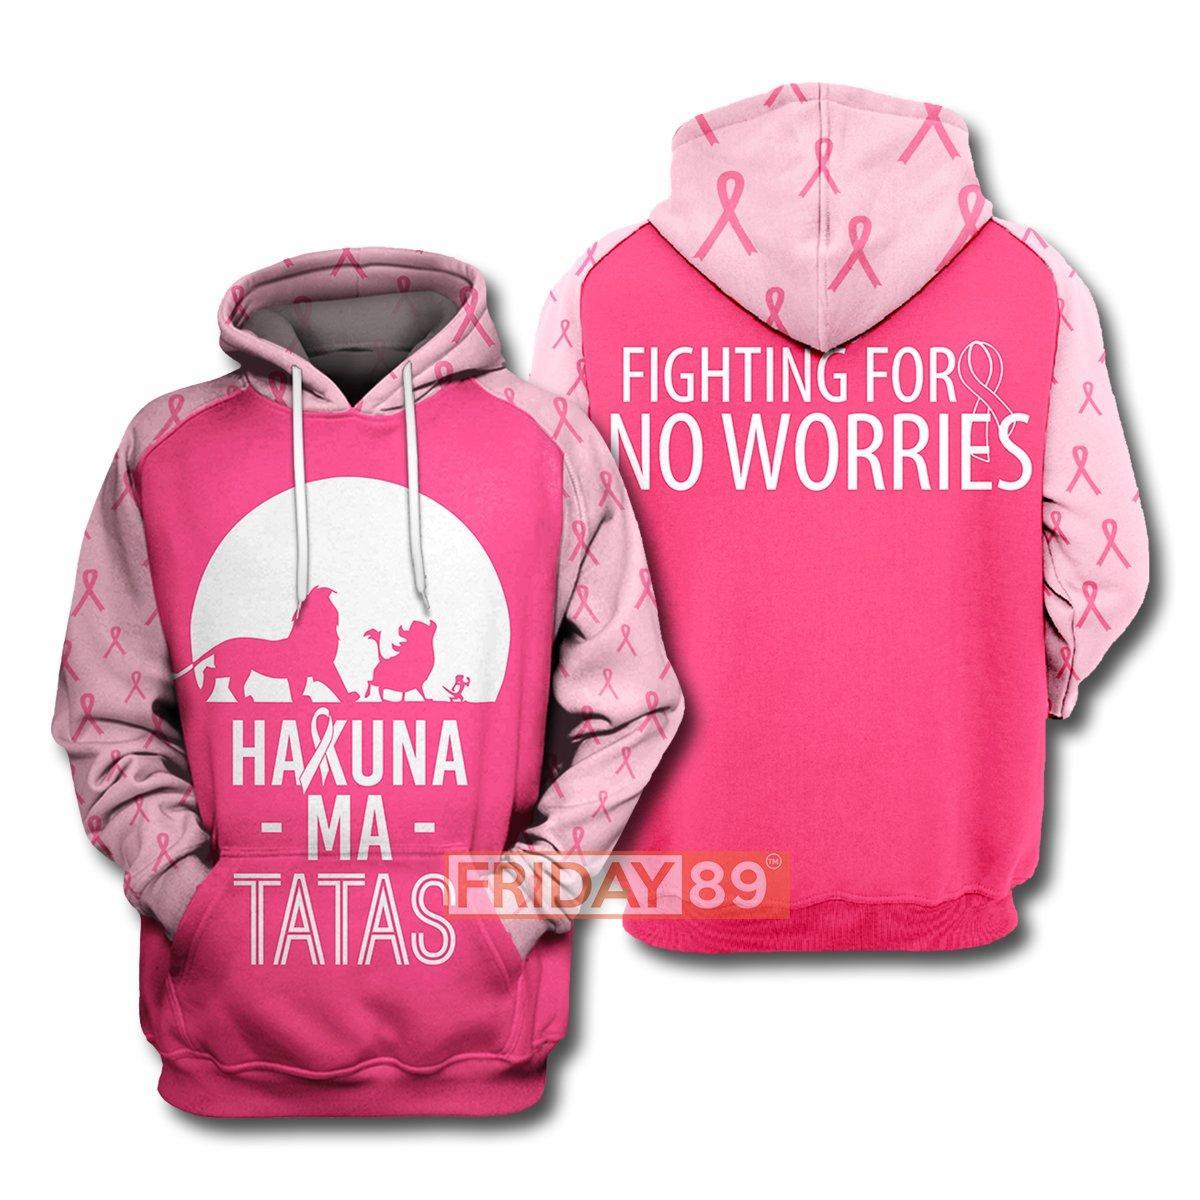 The lion king hakuna ma tatas breast cancer awareness 3d hoodie